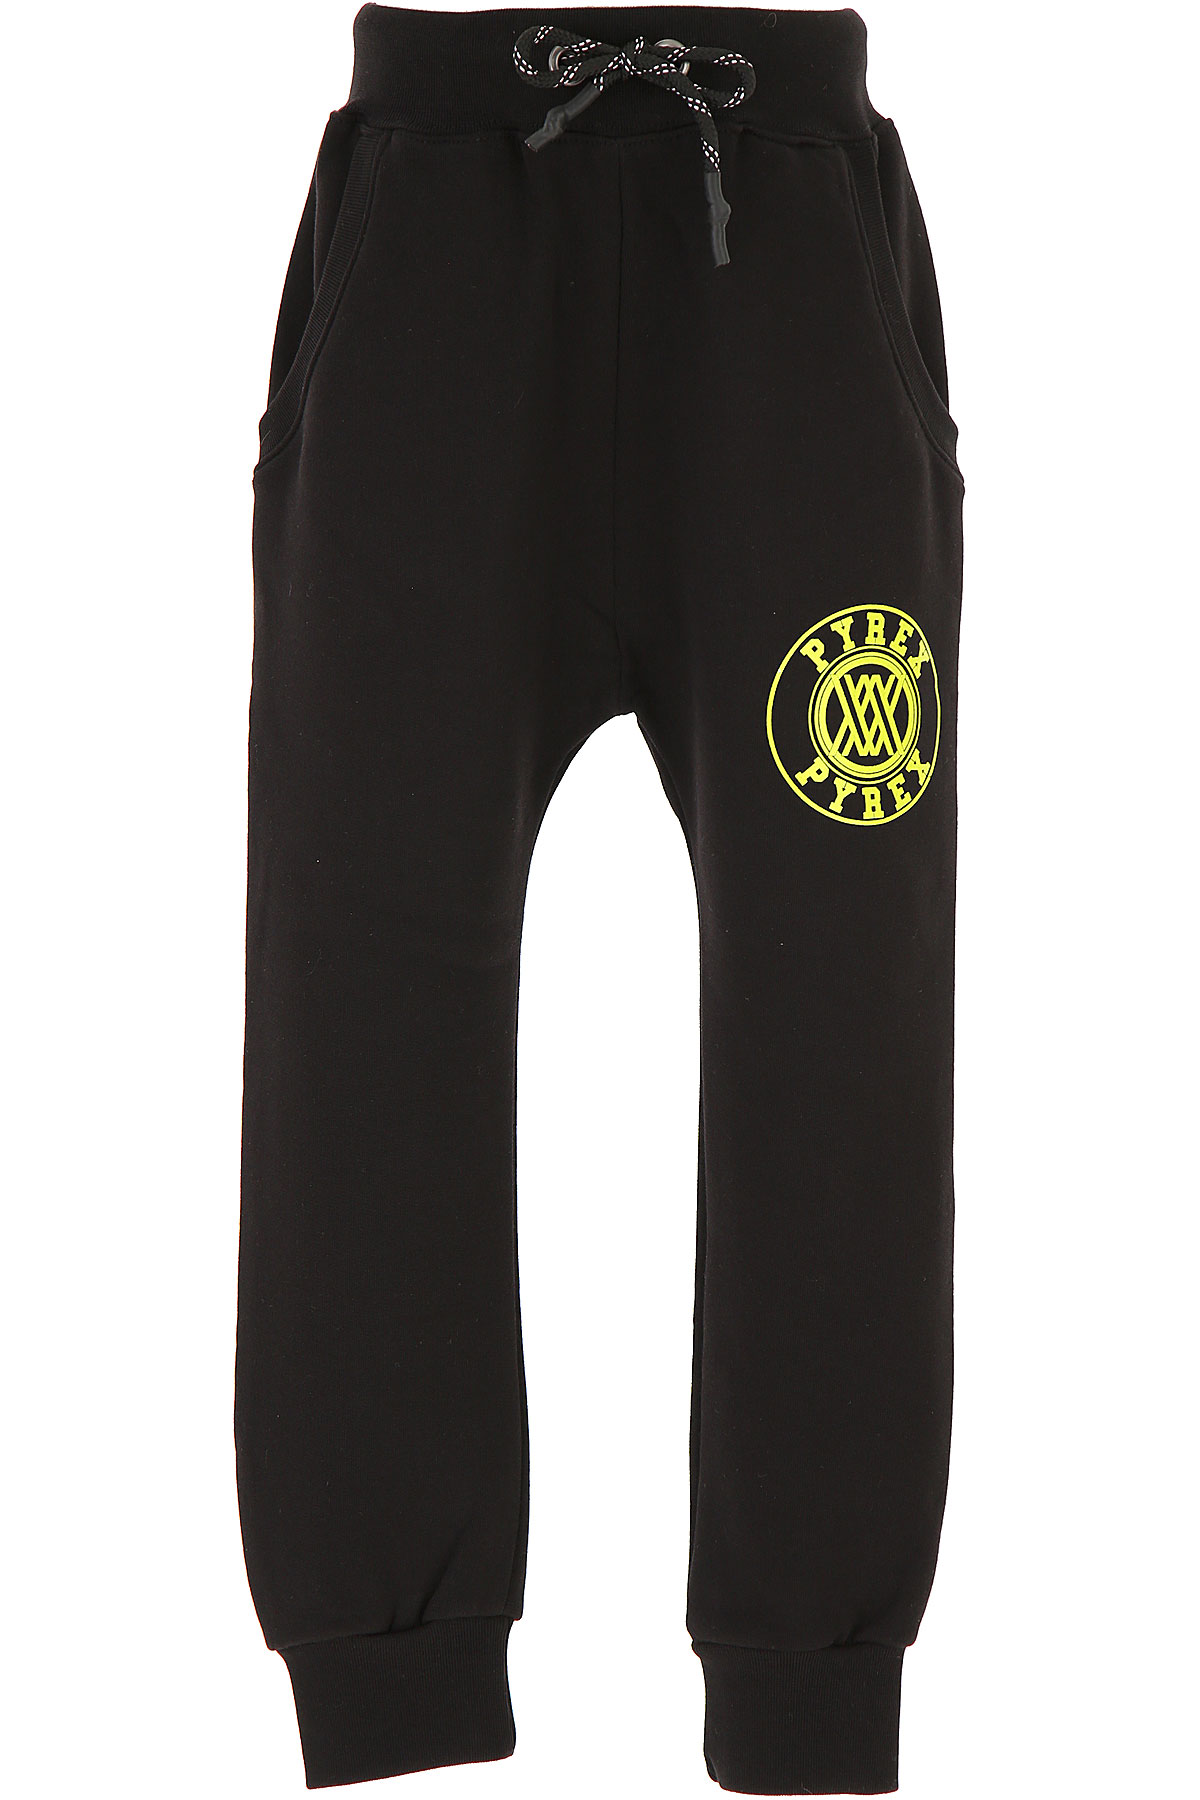 Pyrex Kids Sweatpants for Boys On Sale, Black, Cotton, 2019, M S XL XS XXL (16 Y) XXL (16 Y)